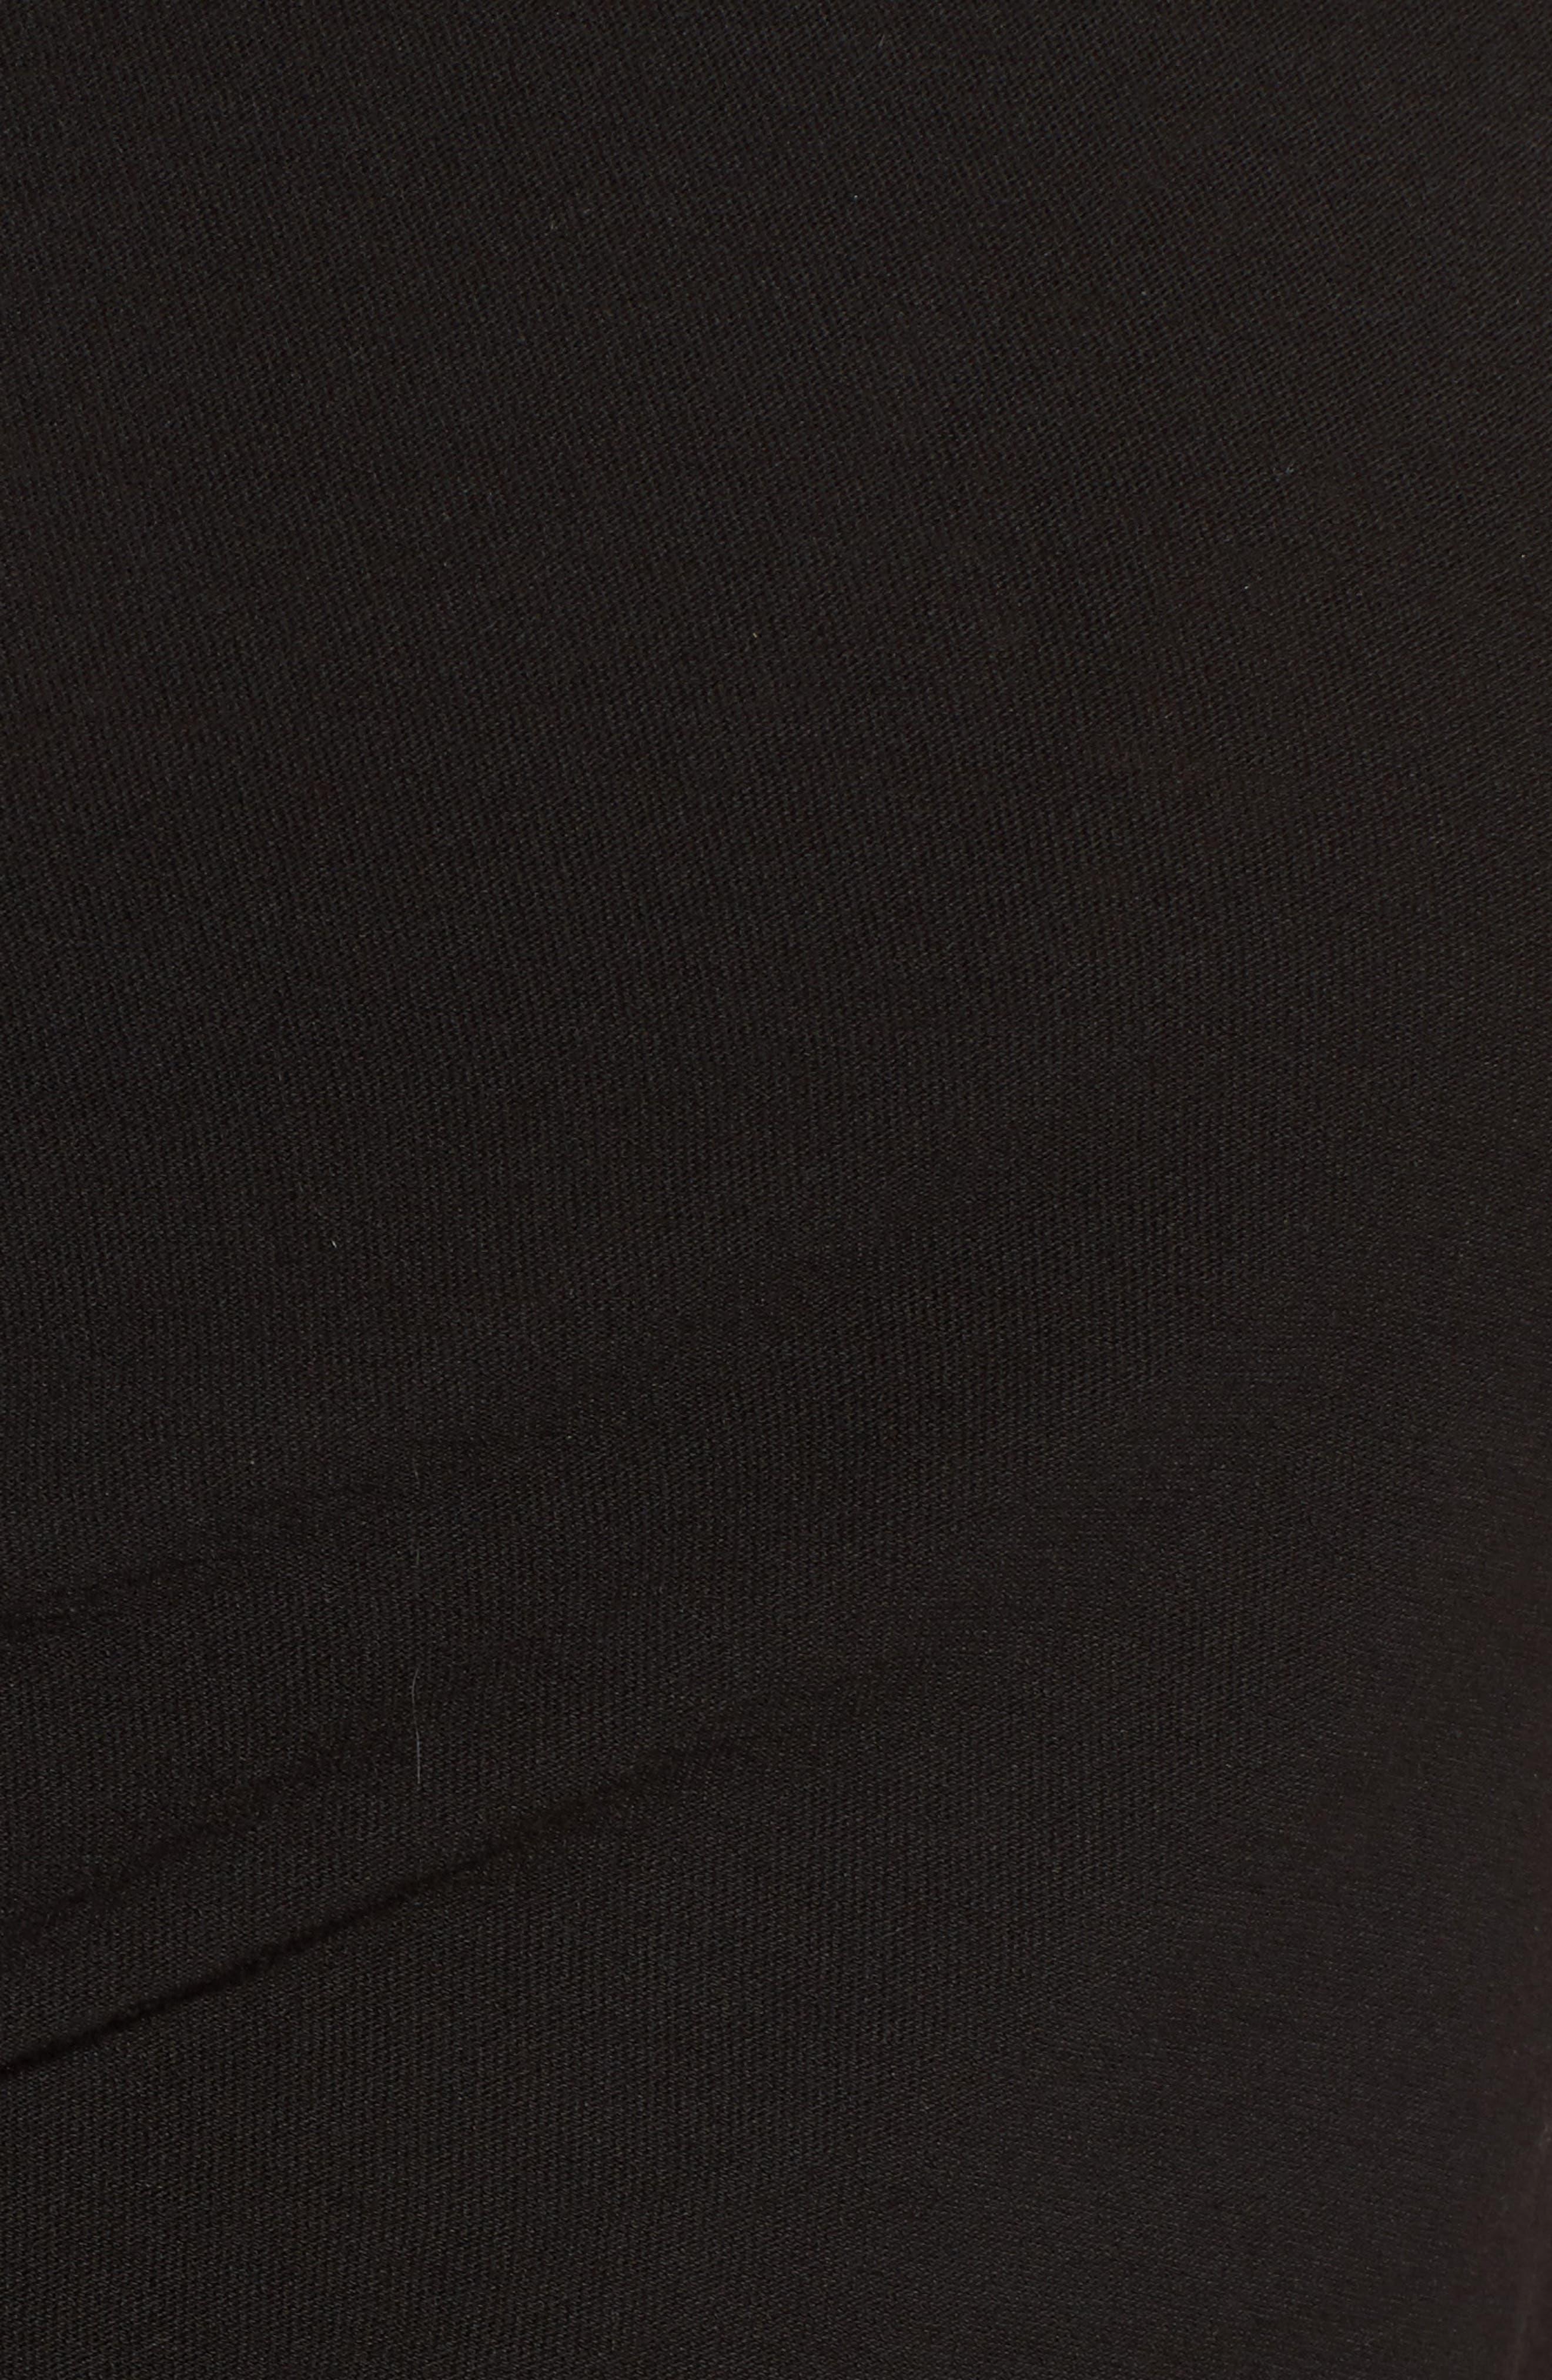 Spiral Shirred Sheath Dress,                             Alternate thumbnail 5, color,                             001